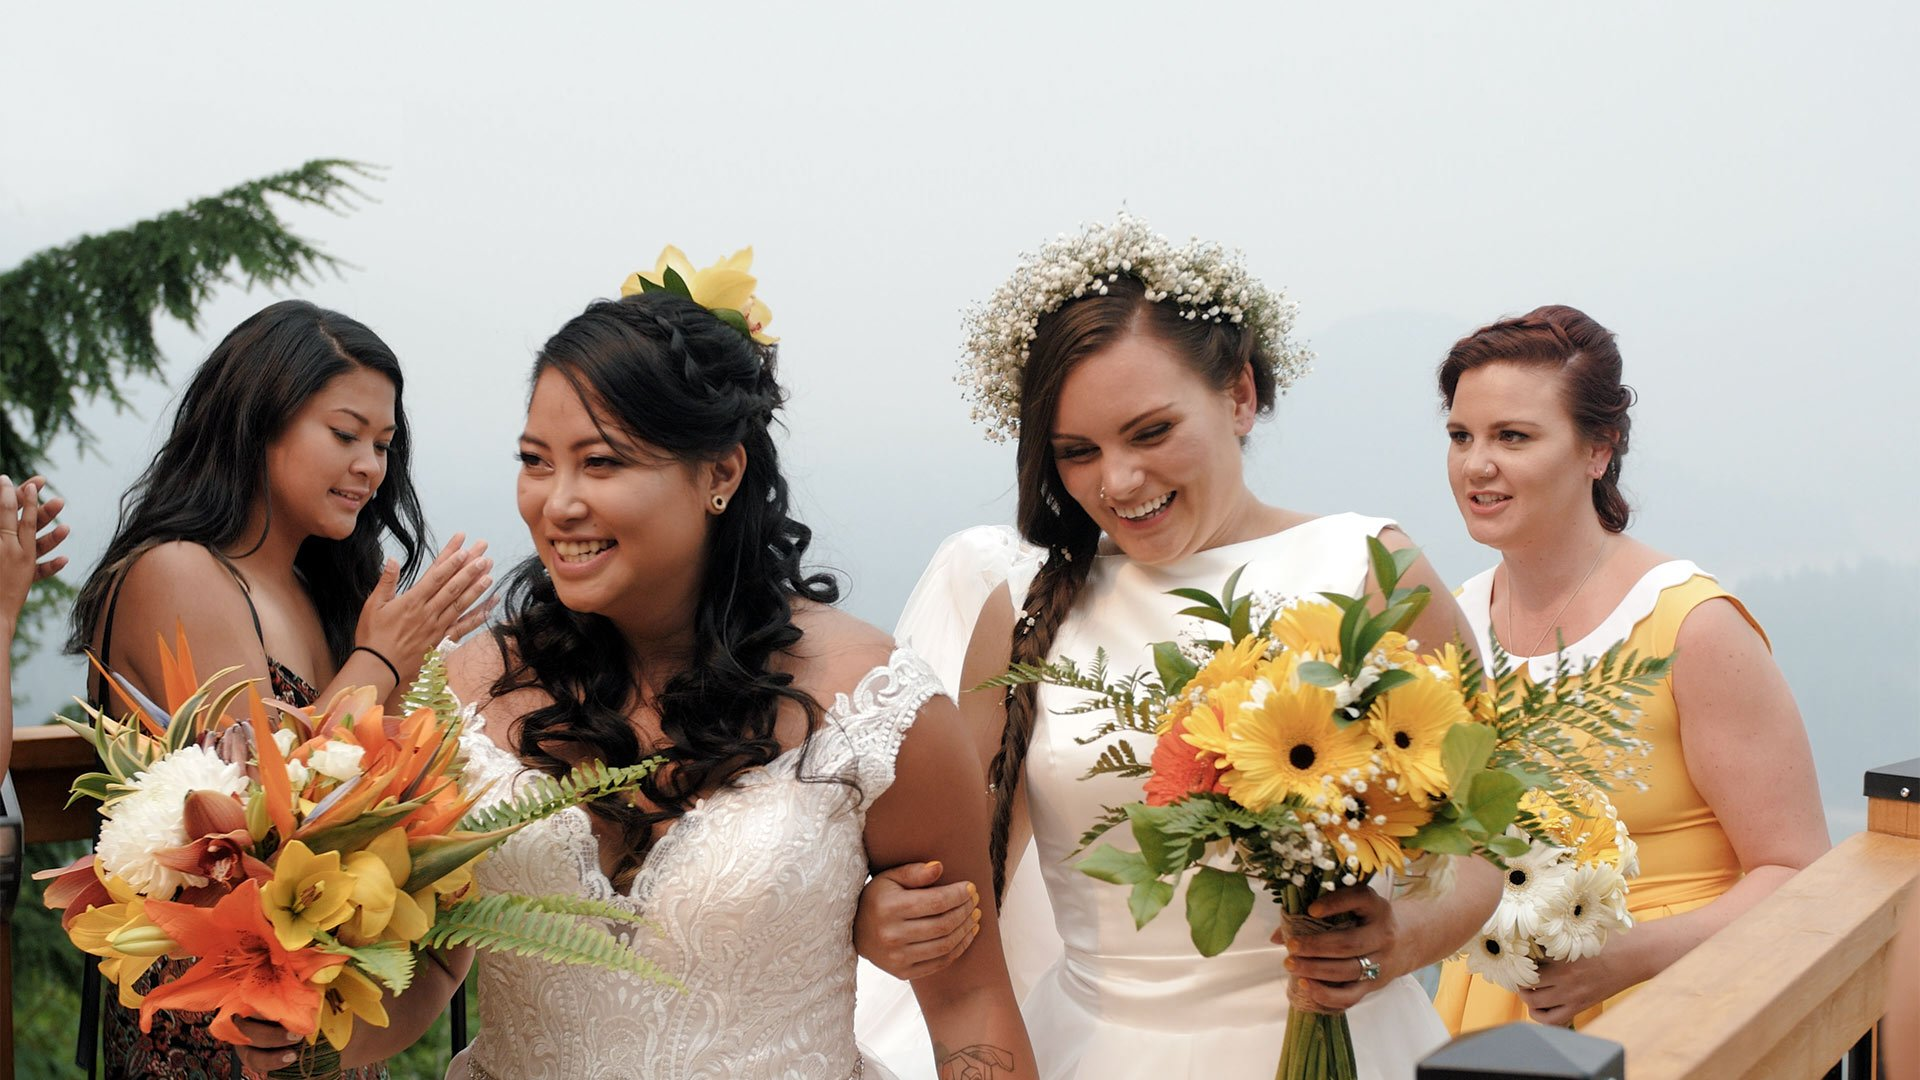 same sex wedding at american creek lodge by toronto wedding videographer kismet creative